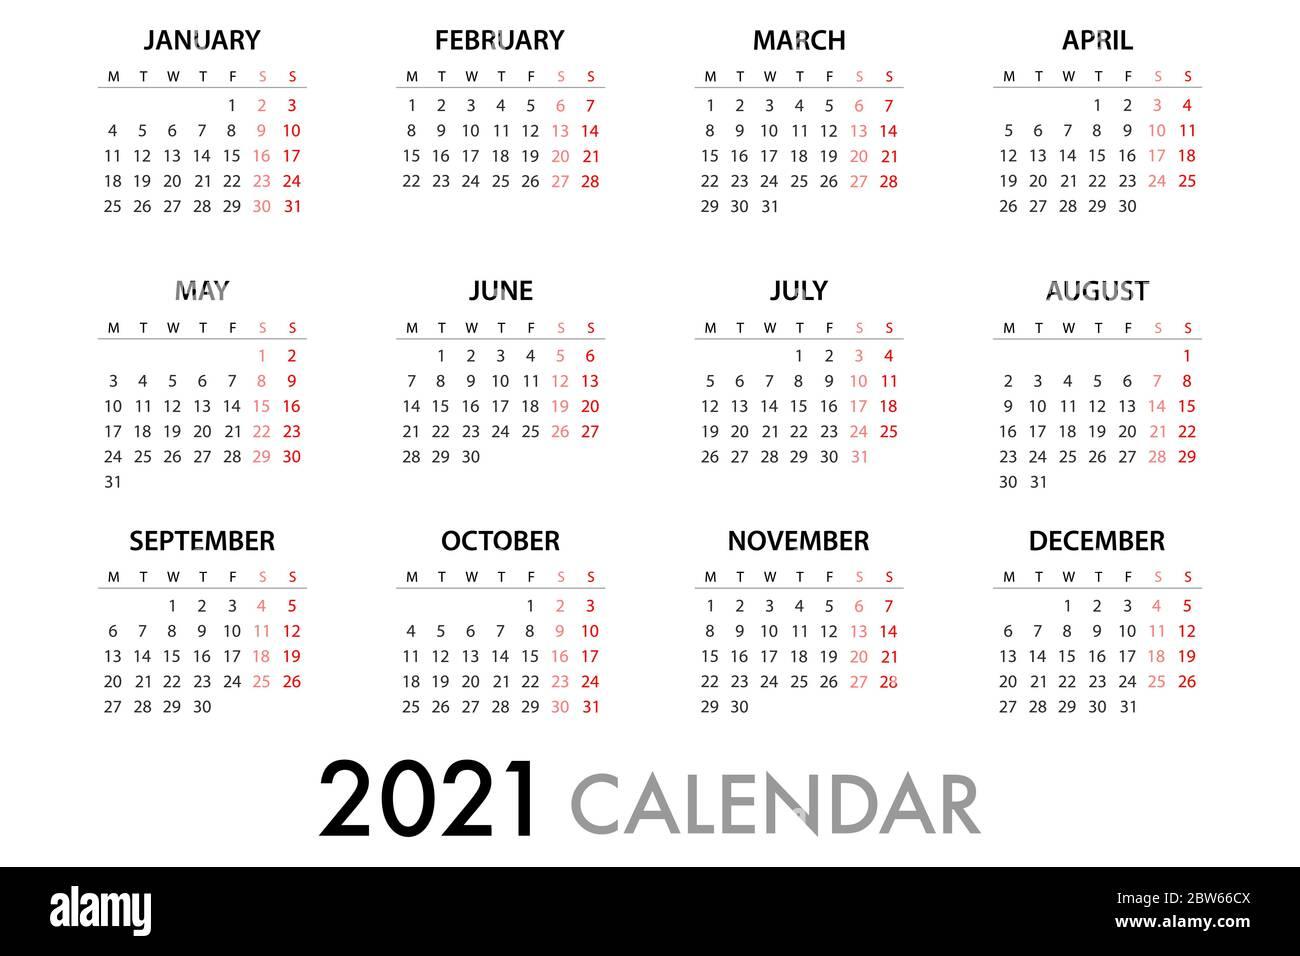 2021 Calendar Starting Monday Calendar planner for 2021 Week Starts Monday. Simple Vector